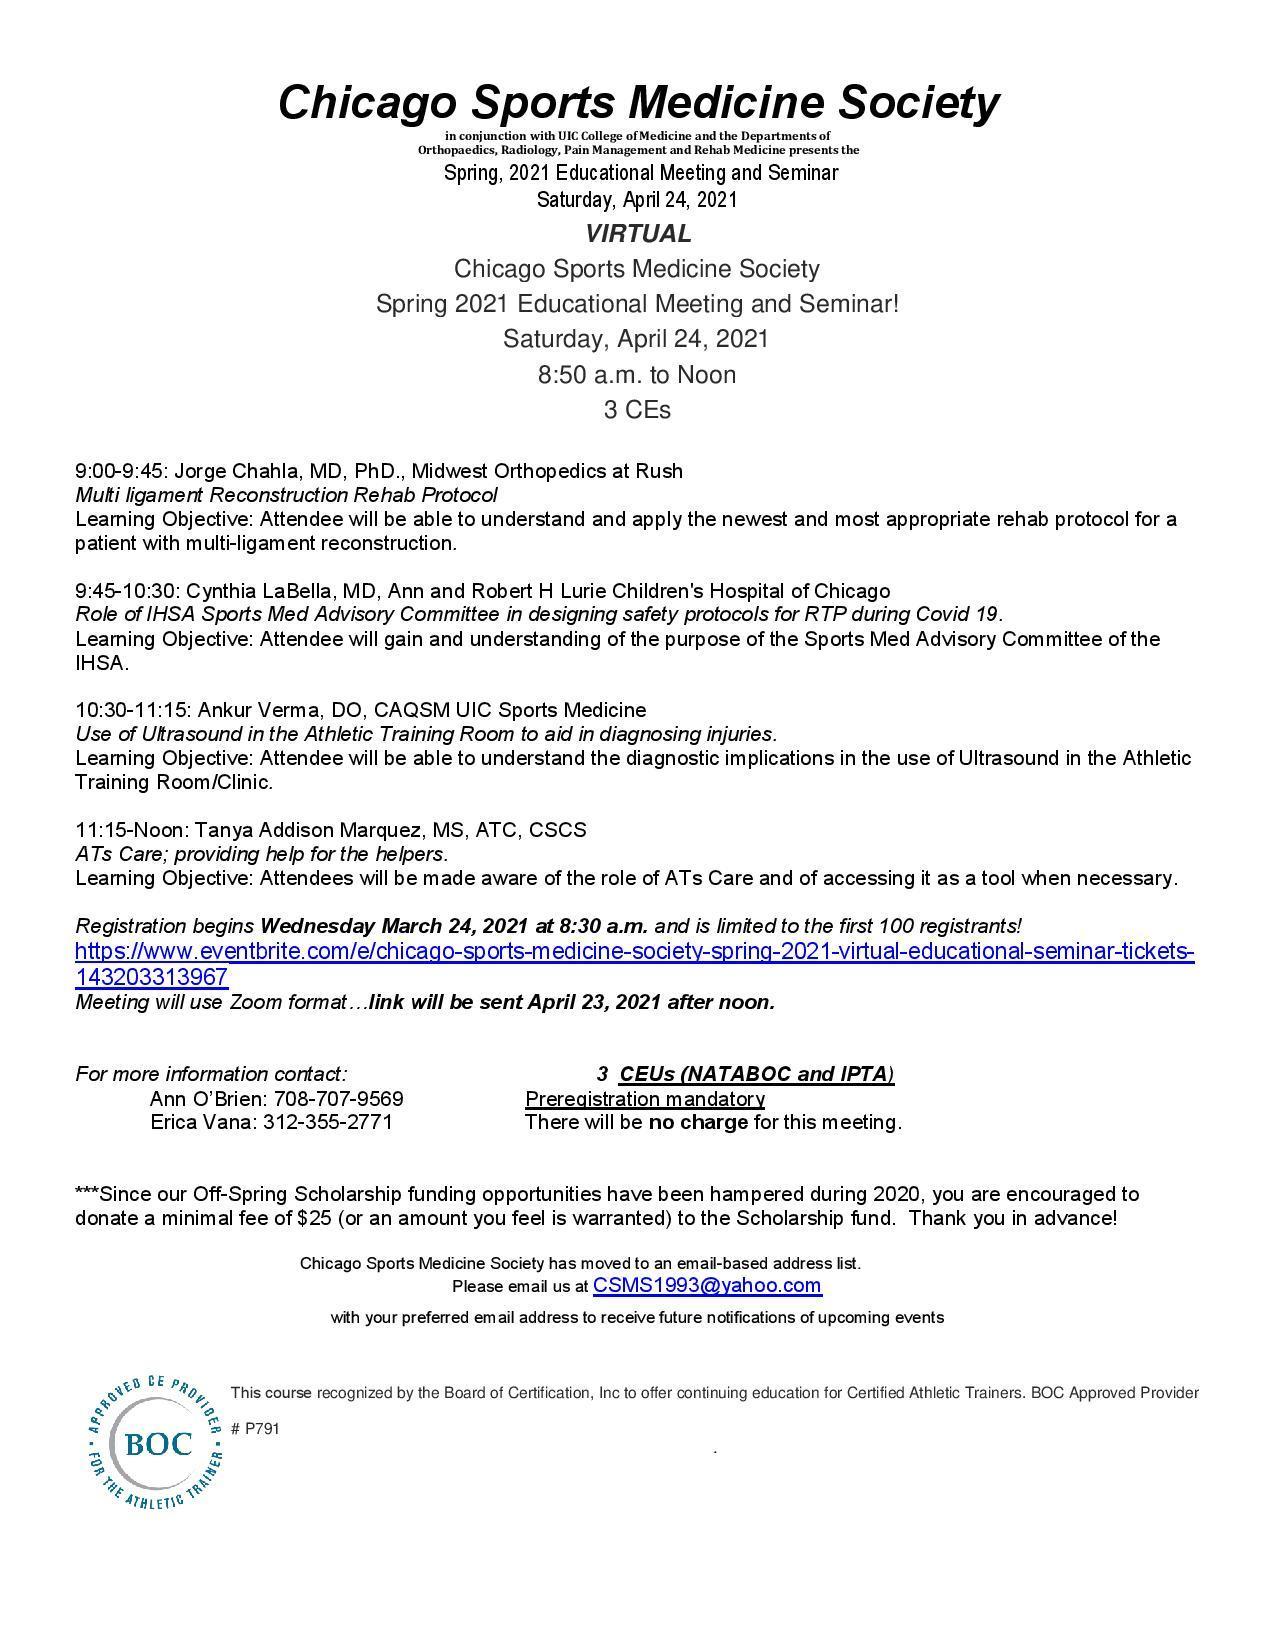 CSMS spring seminar flyer